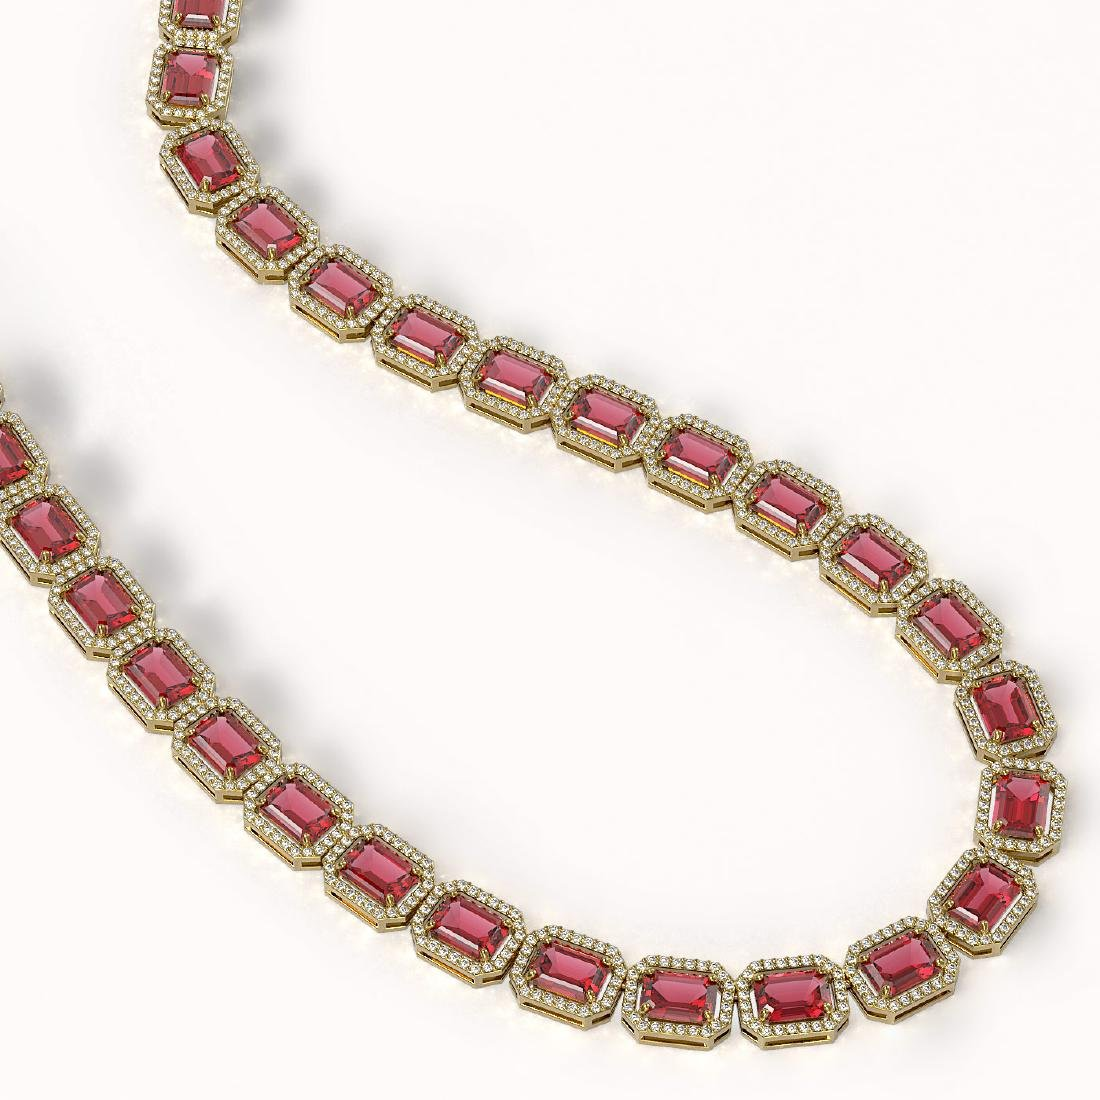 60.49 CTW Tourmaline & Diamond Halo Necklace 10K Yellow - 2